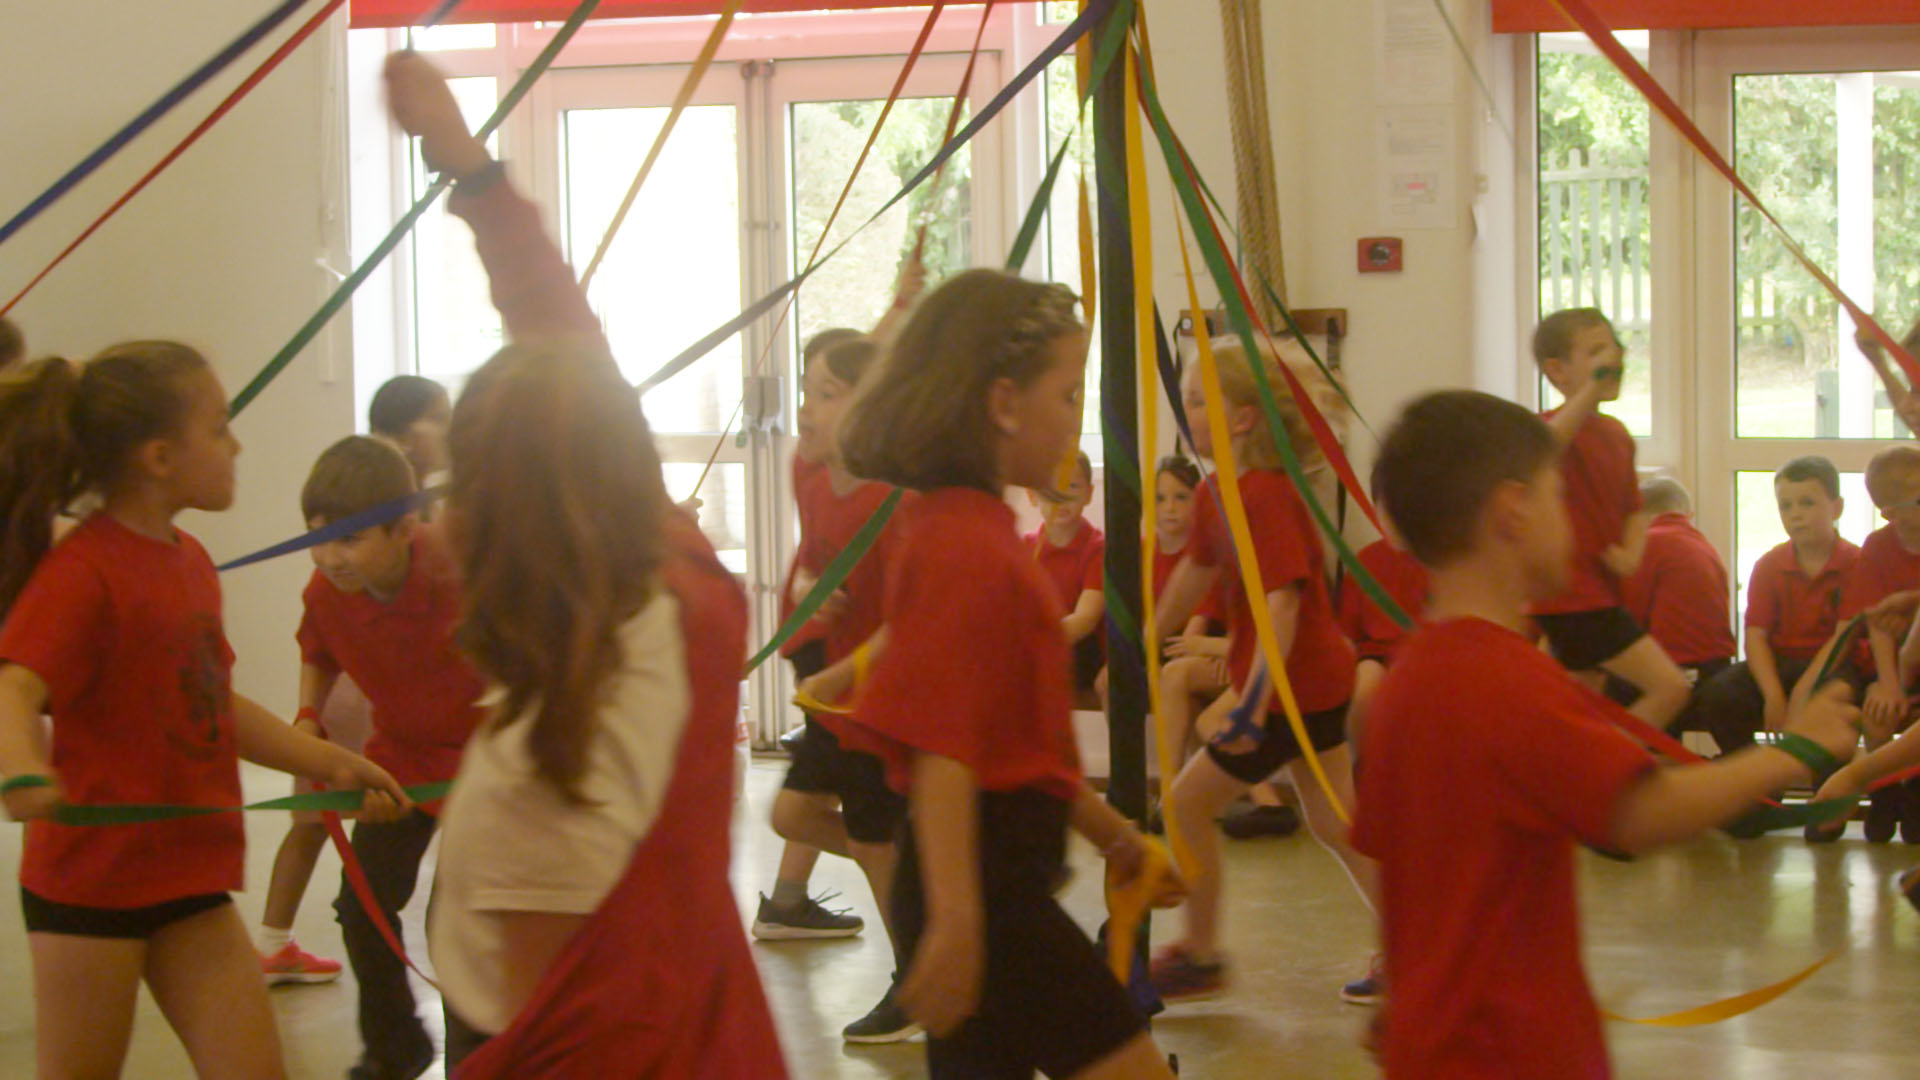 School children dancing around the may pole